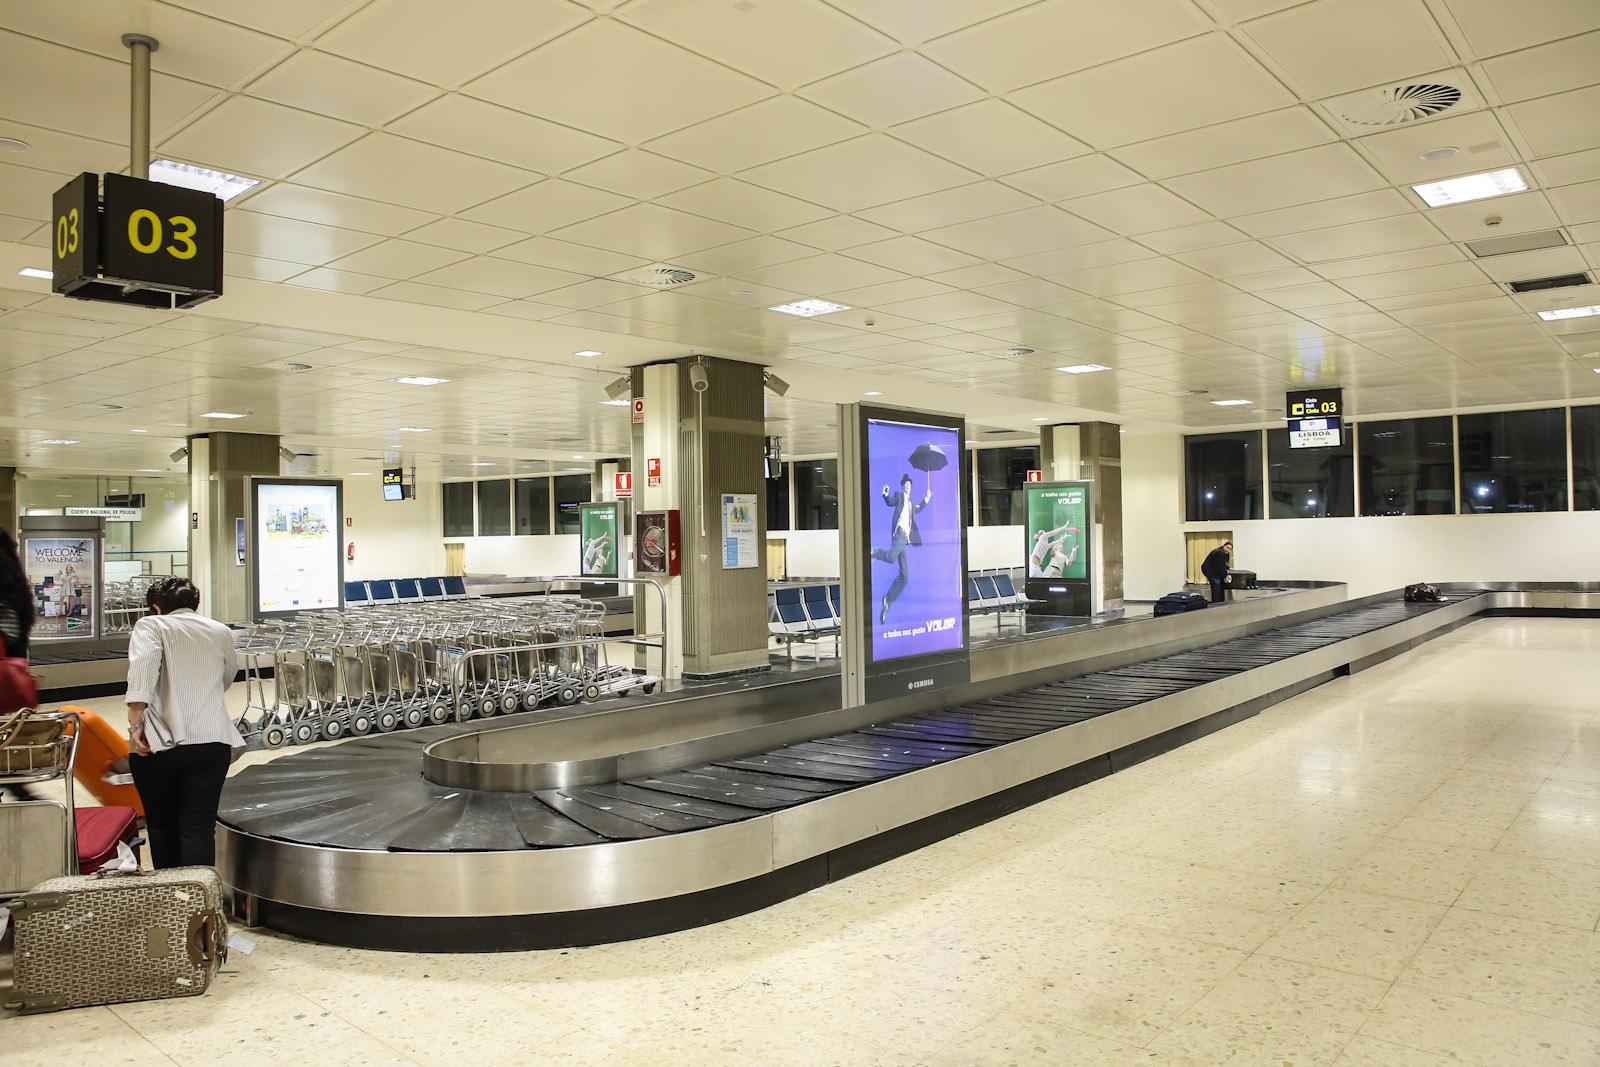 Зал выдачи багажа в аэропорту Валенсия